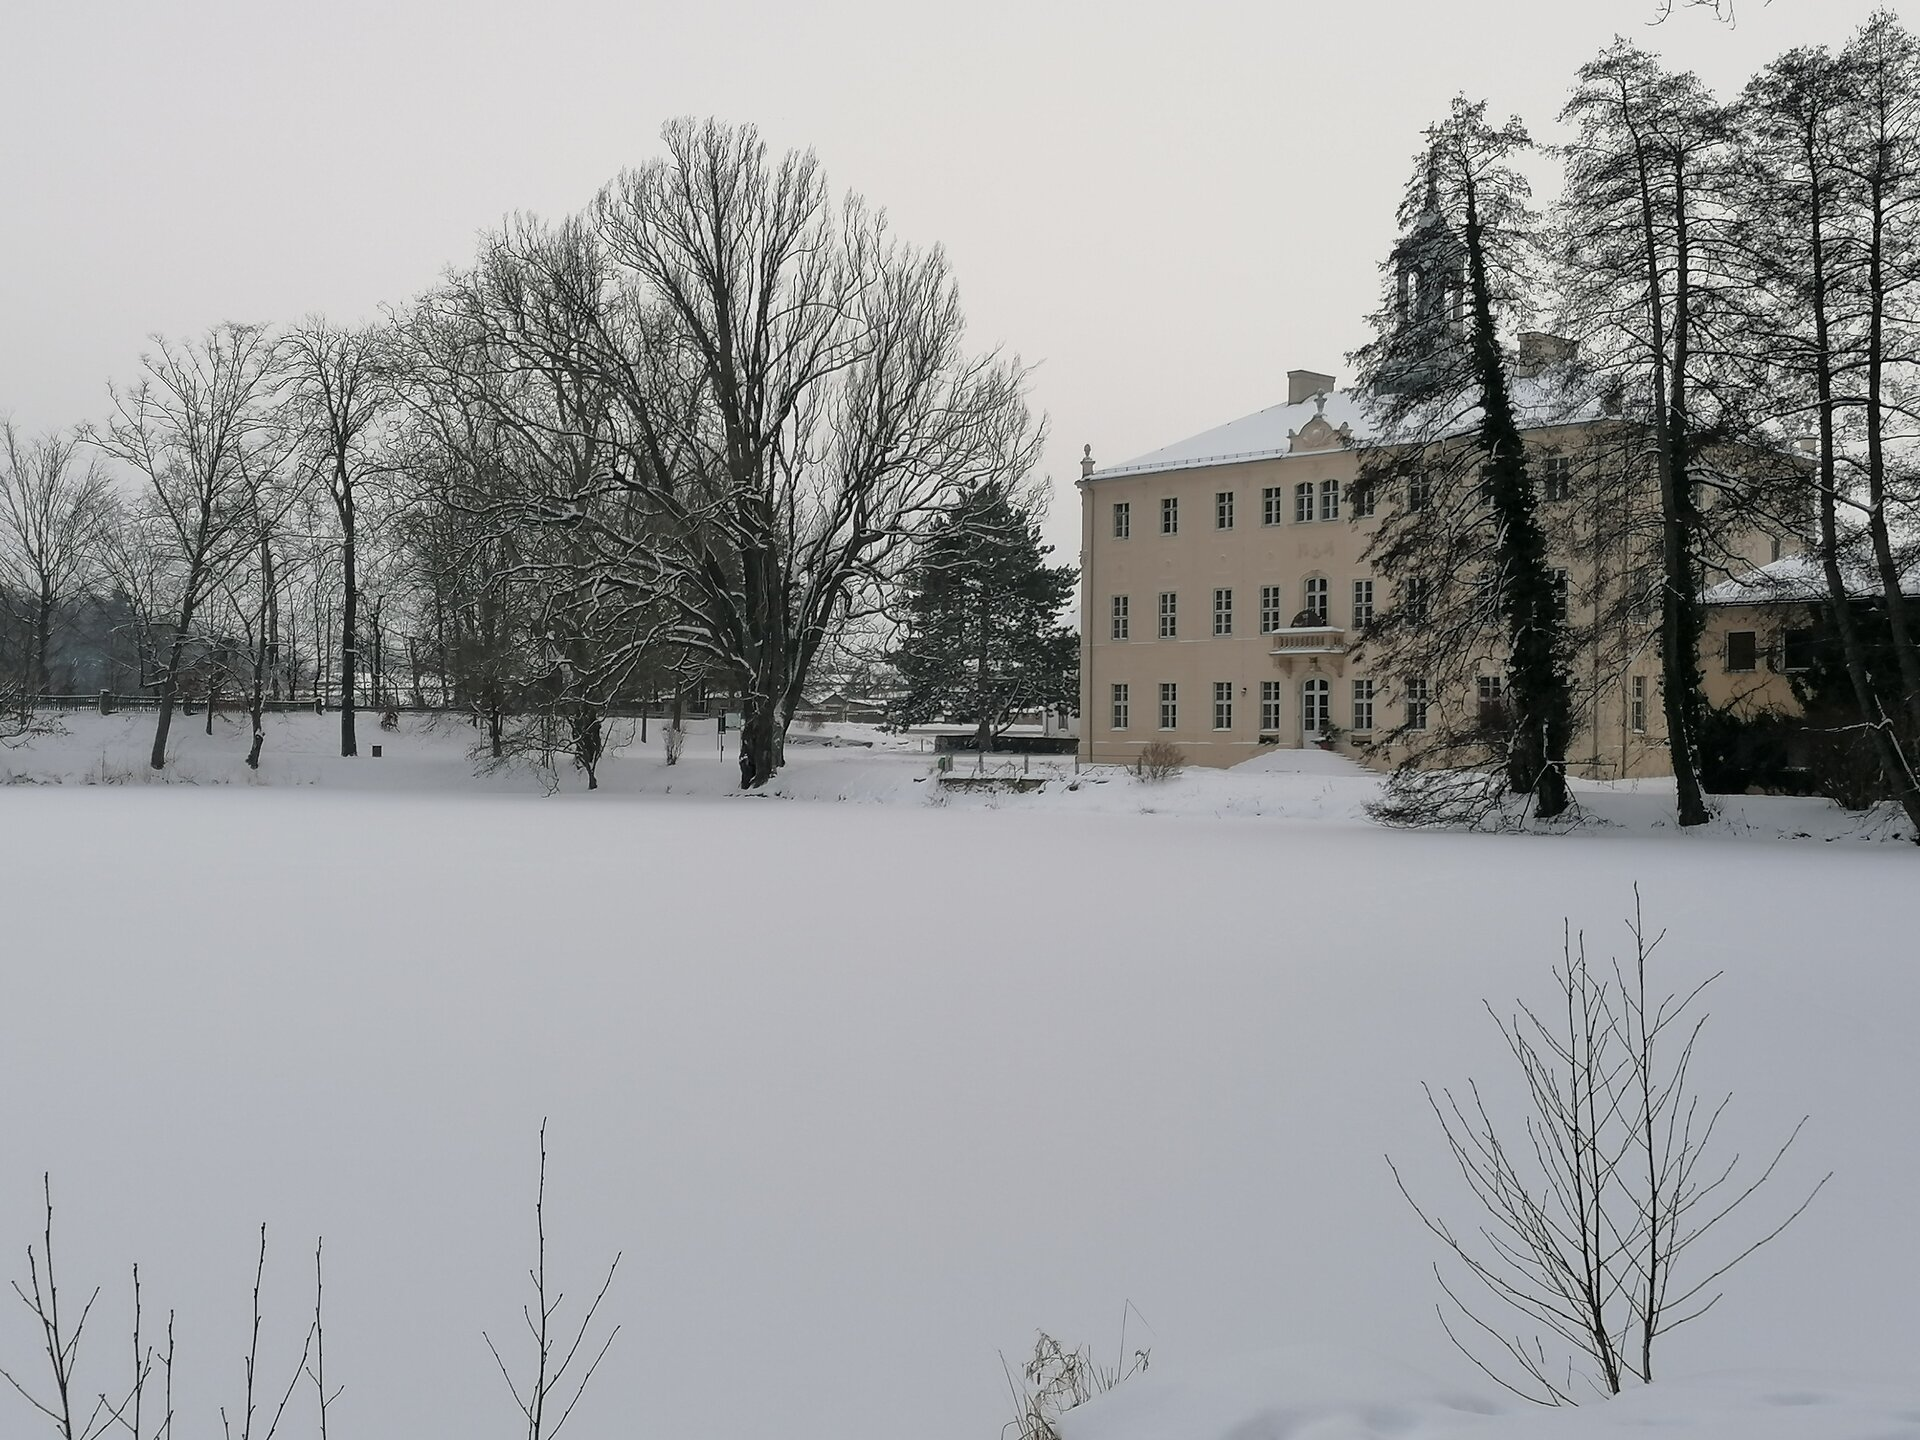 Park Lauterbach